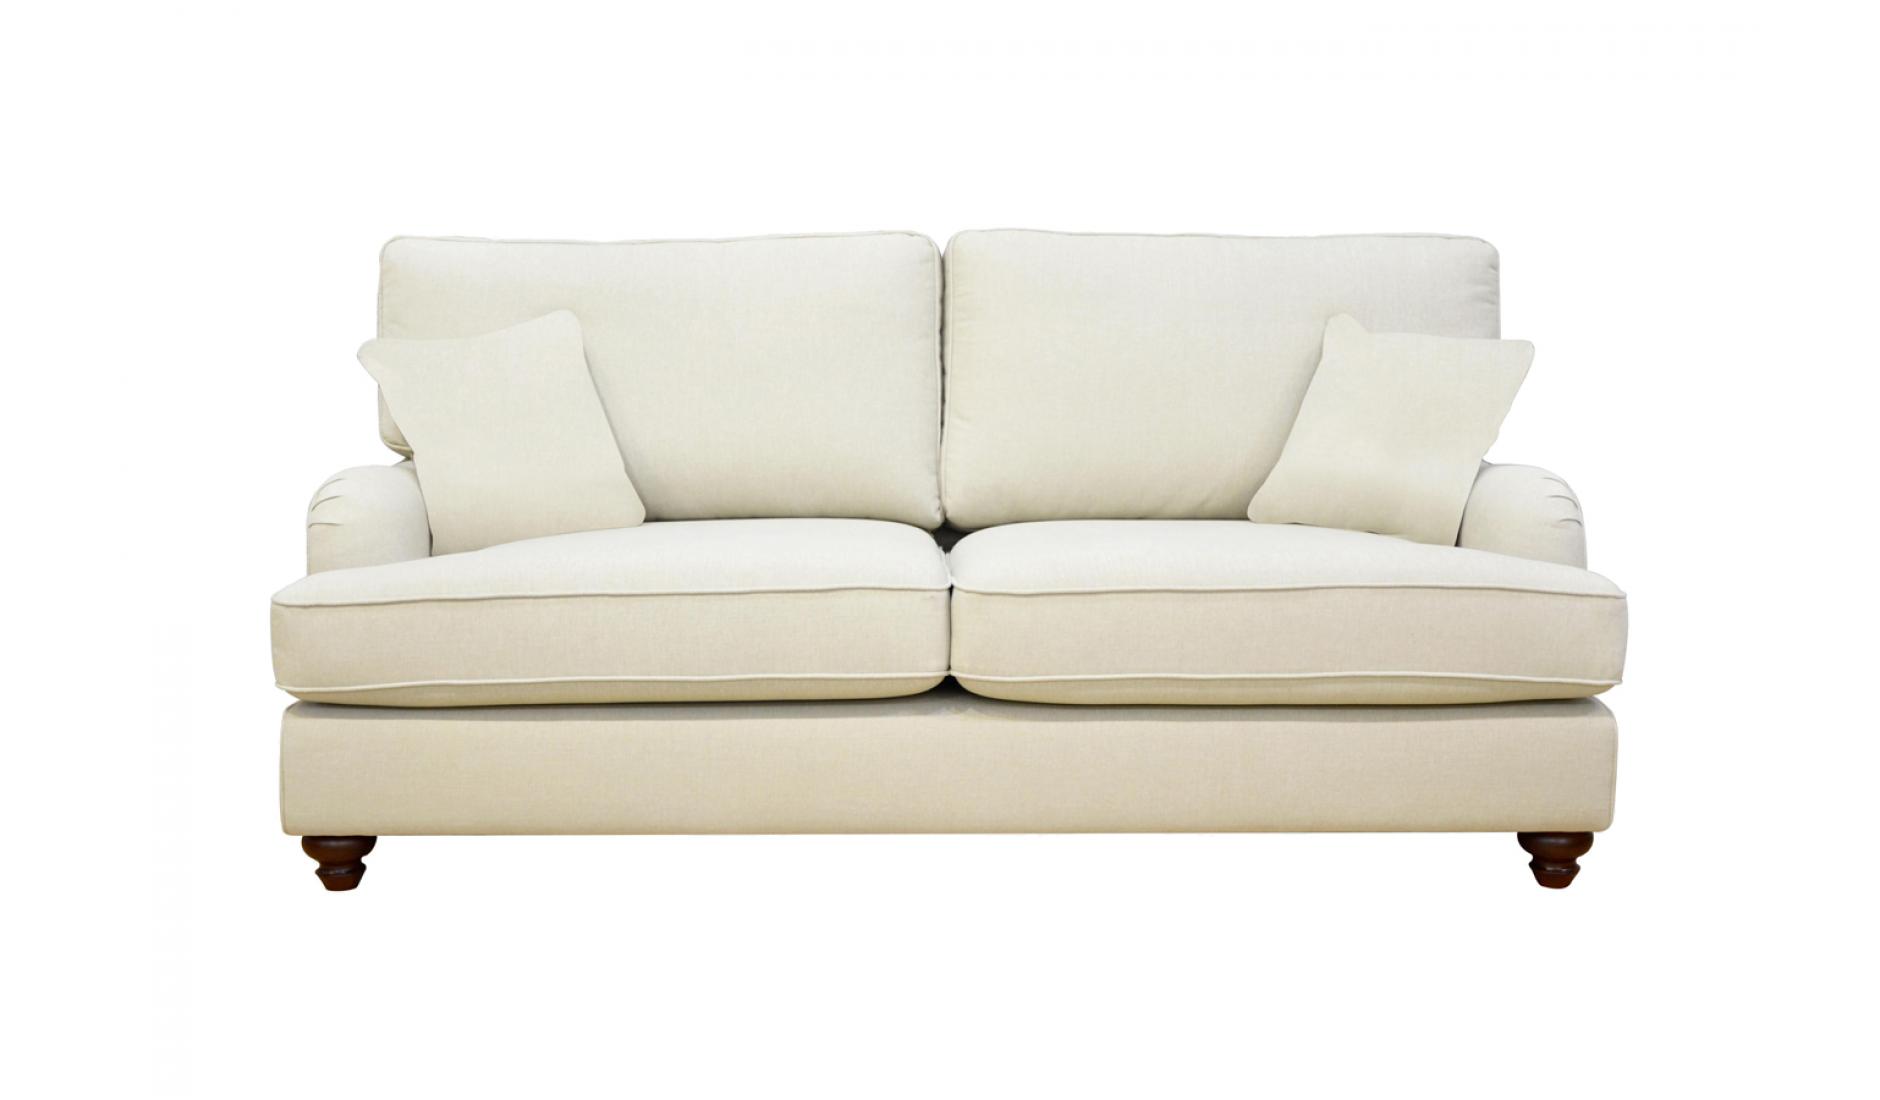 Carnation 3 Seater Sofa